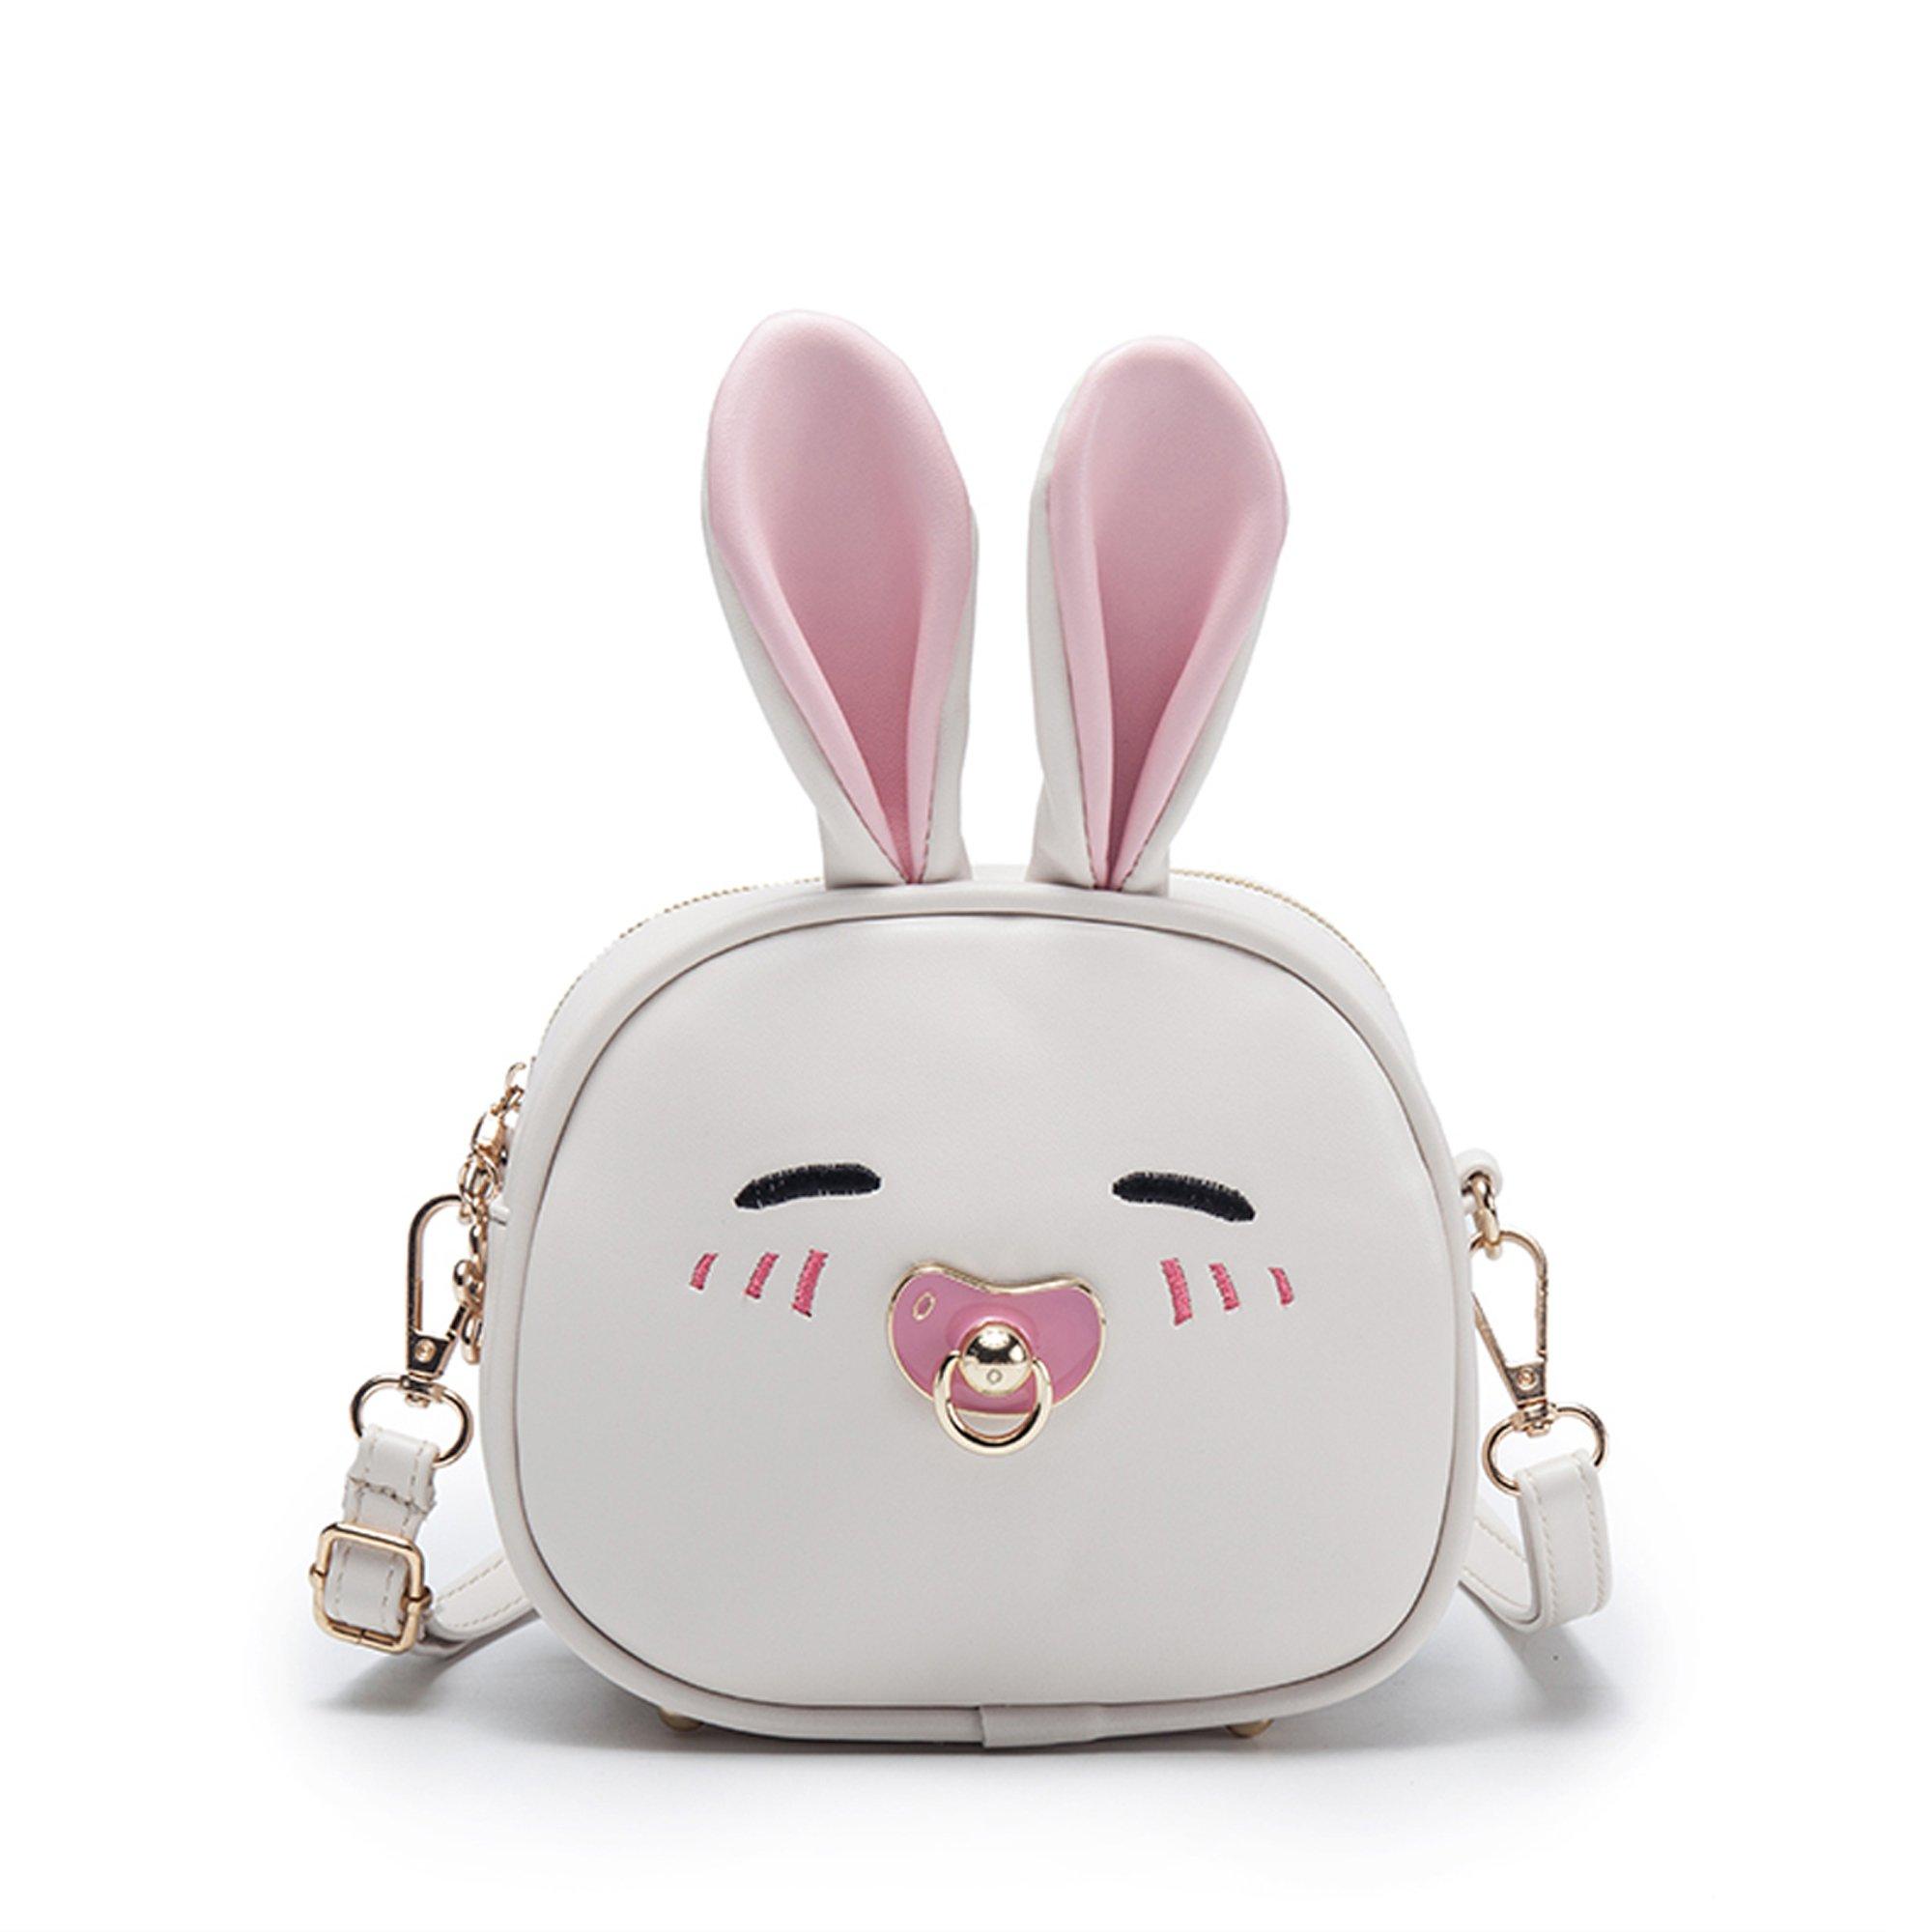 JIANBAO Child Girls Cute Mini Travel Backpacks Purses Convertible Cross Shoulder Bags Stylish Satchel Outdoor Gifts (bunny white)